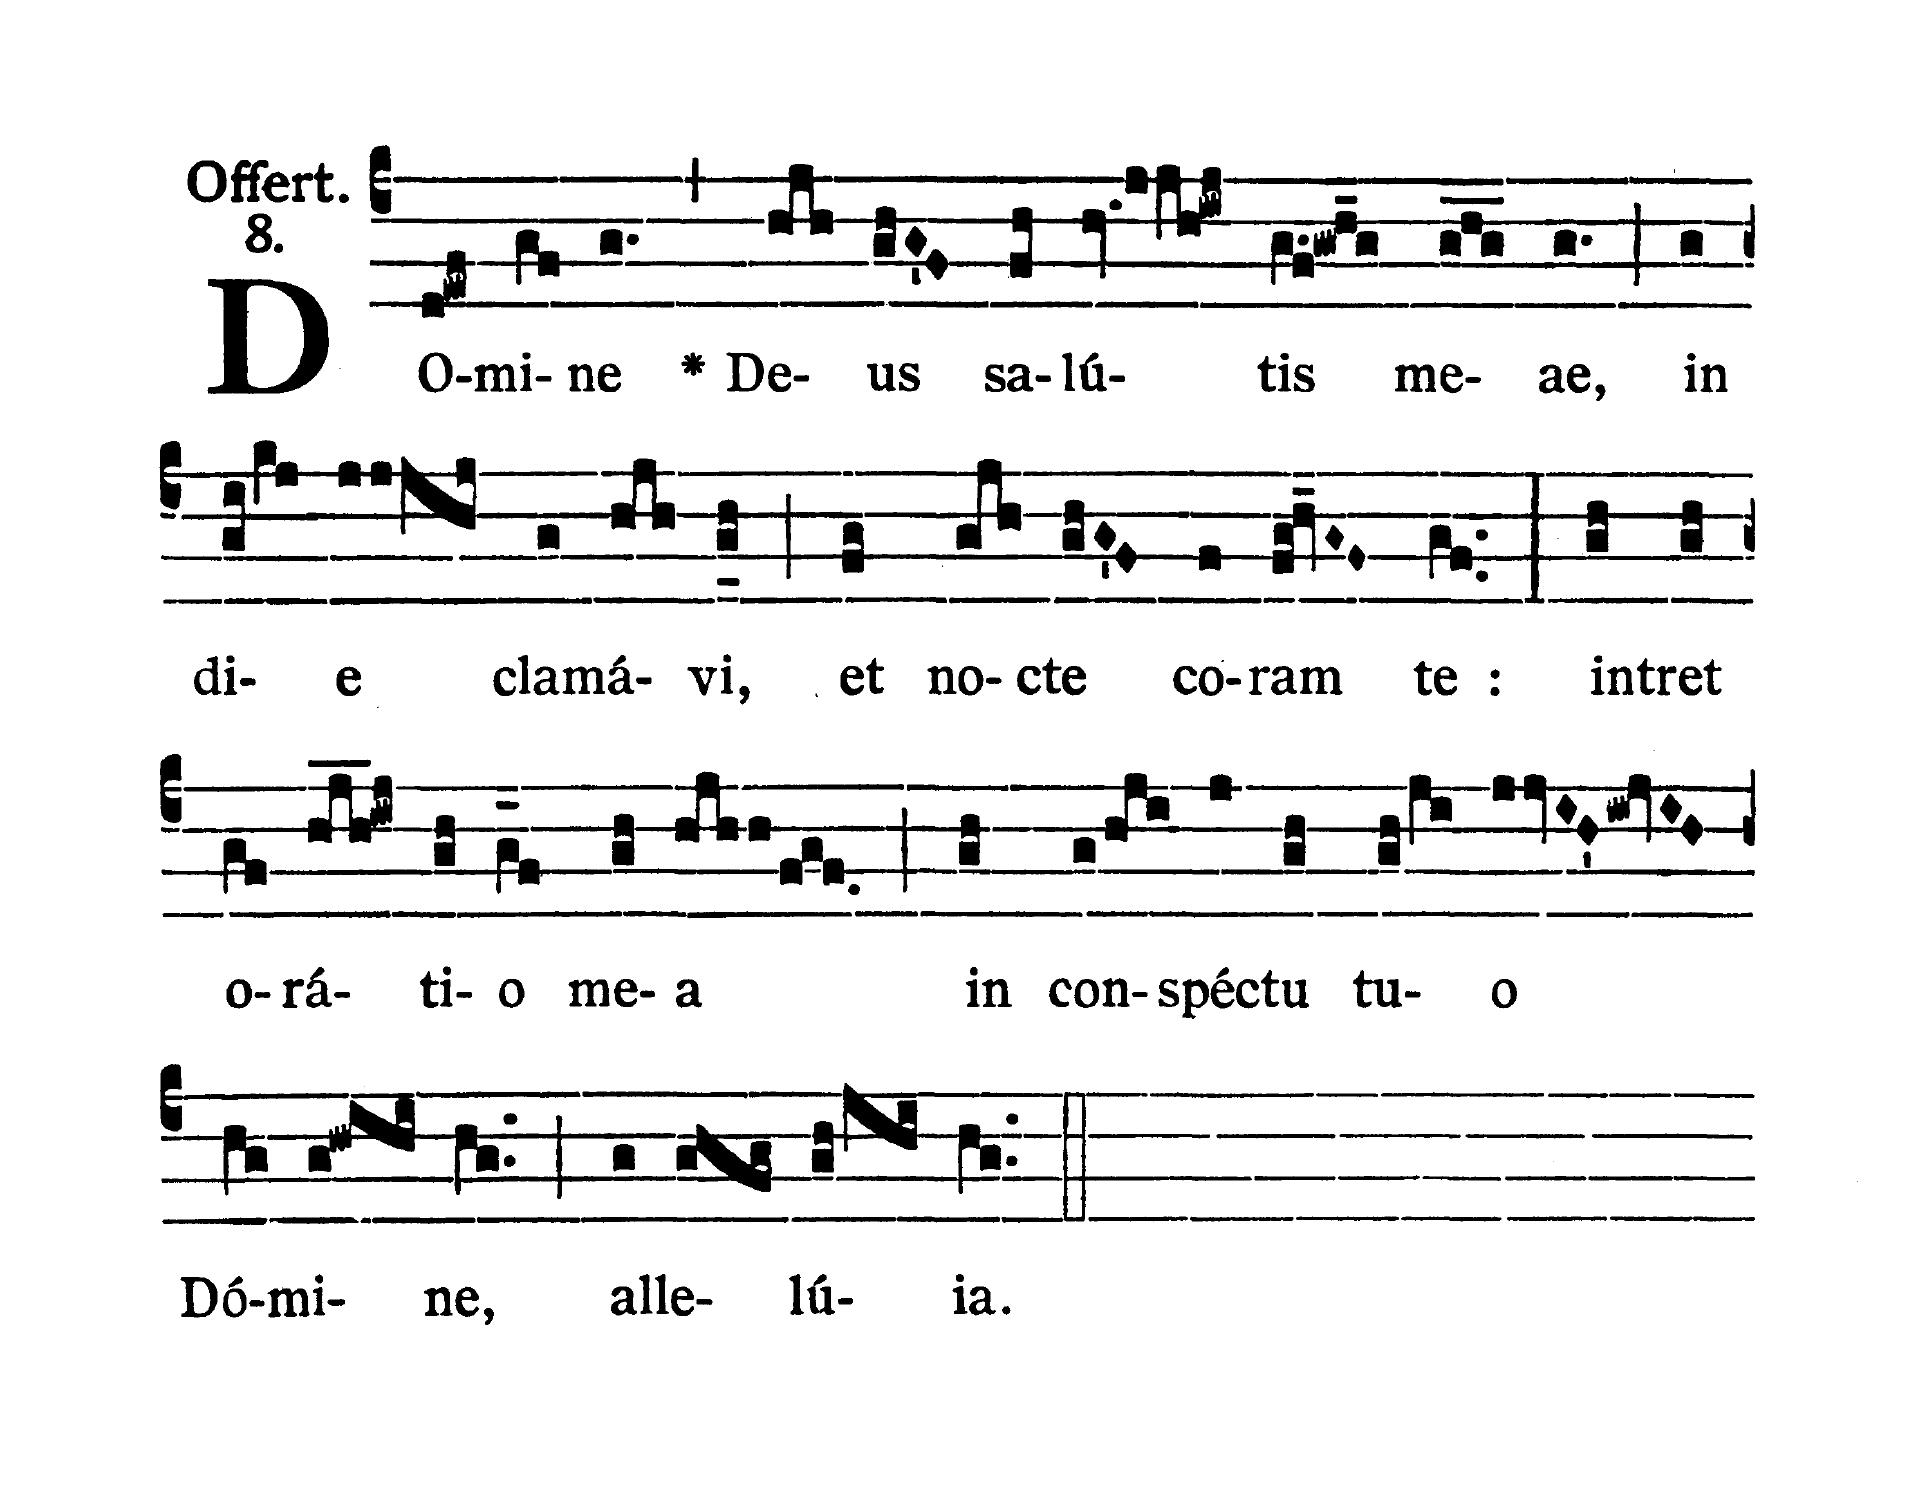 Sabbato infra Octavam Pentecostes (Sobota w oktawie Zesłania Ducha Świętego) - Offertorium (Domine Deus salutis meae)